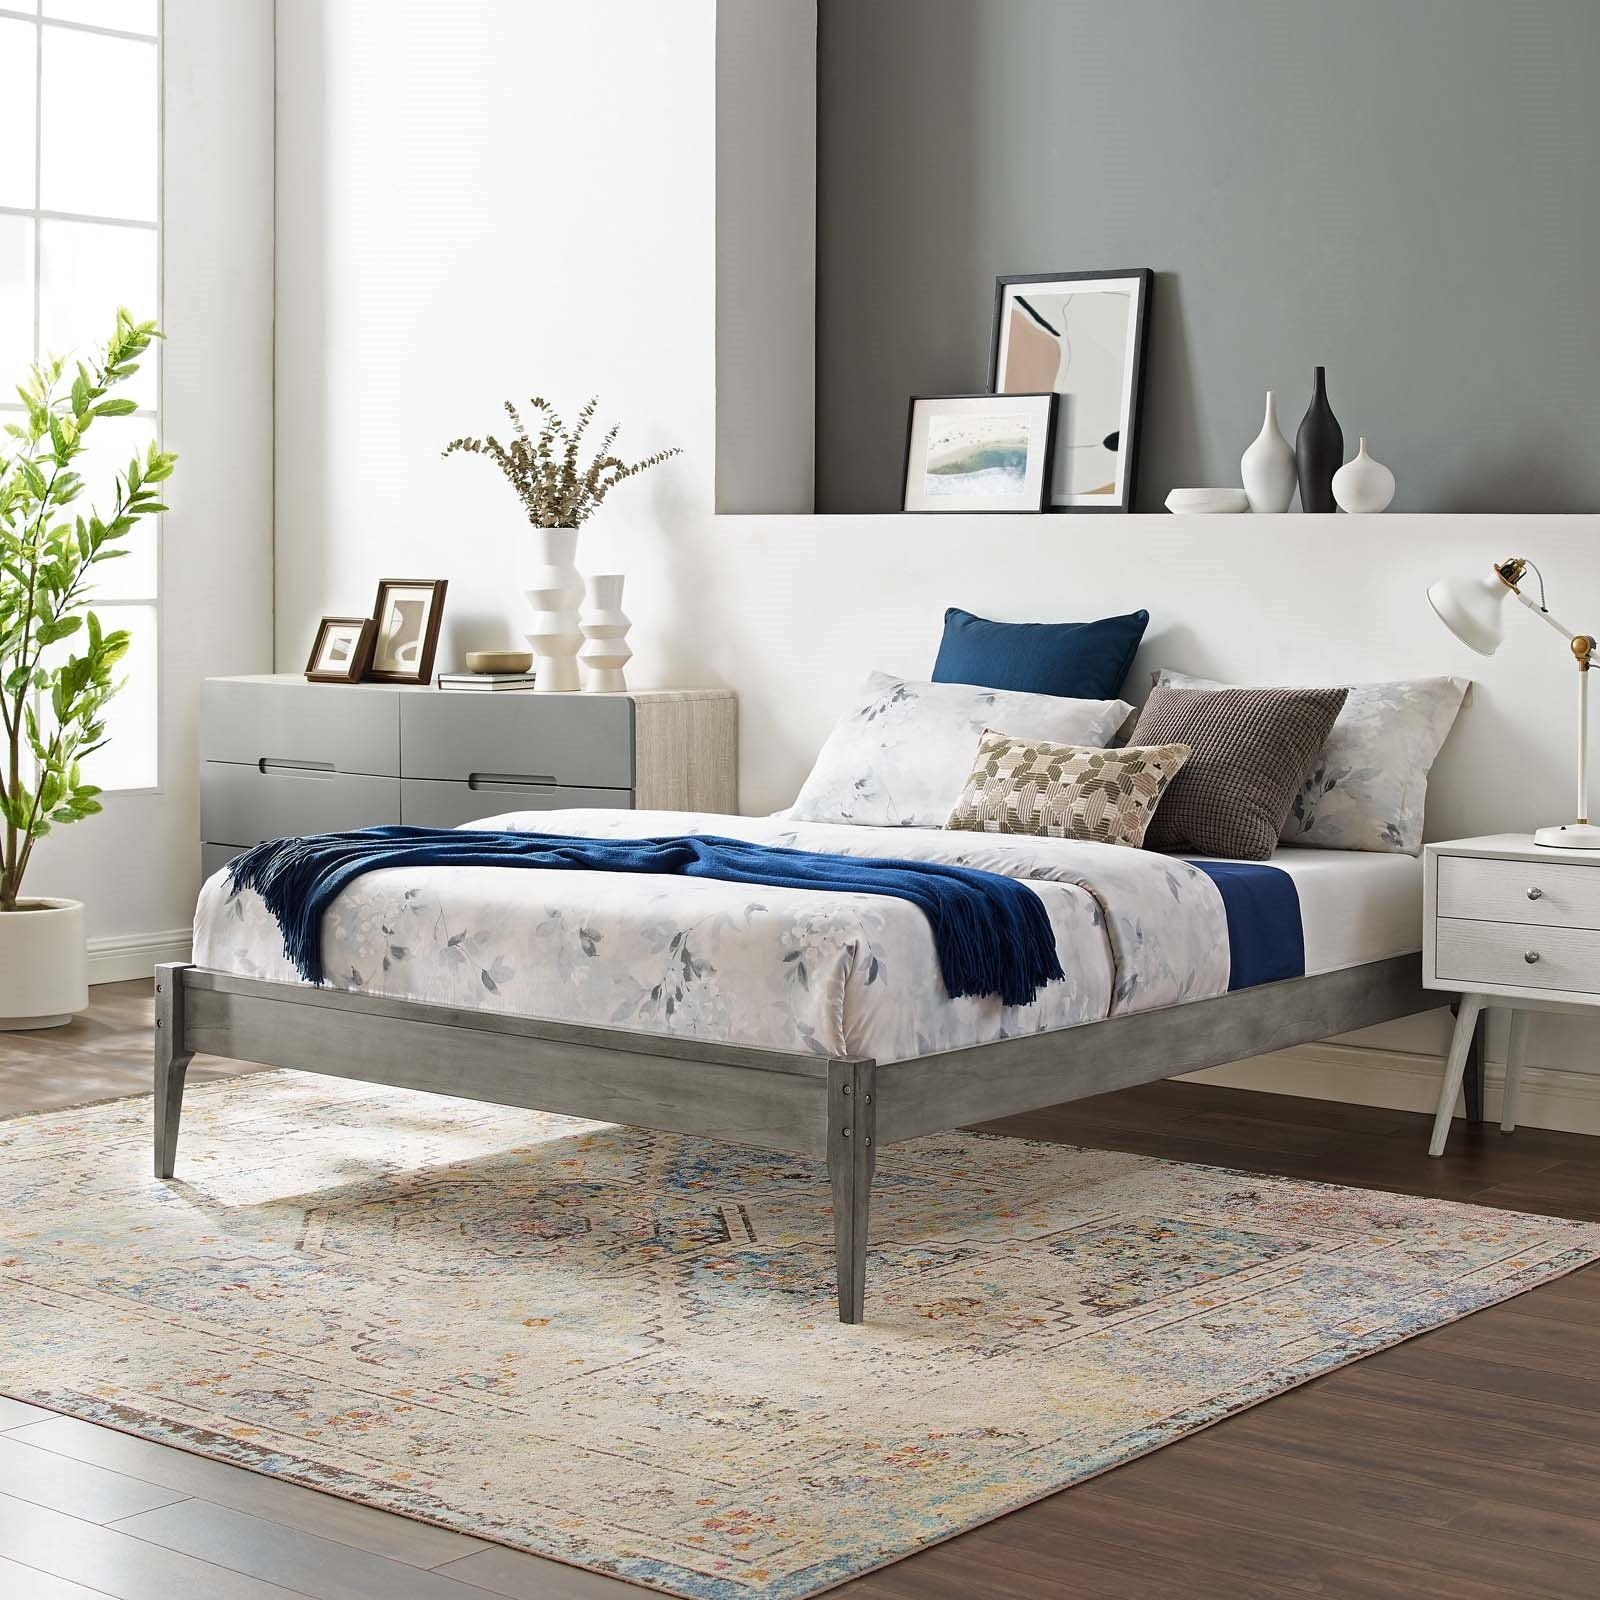 June Twin Wood Platform Bed Frame in Gray